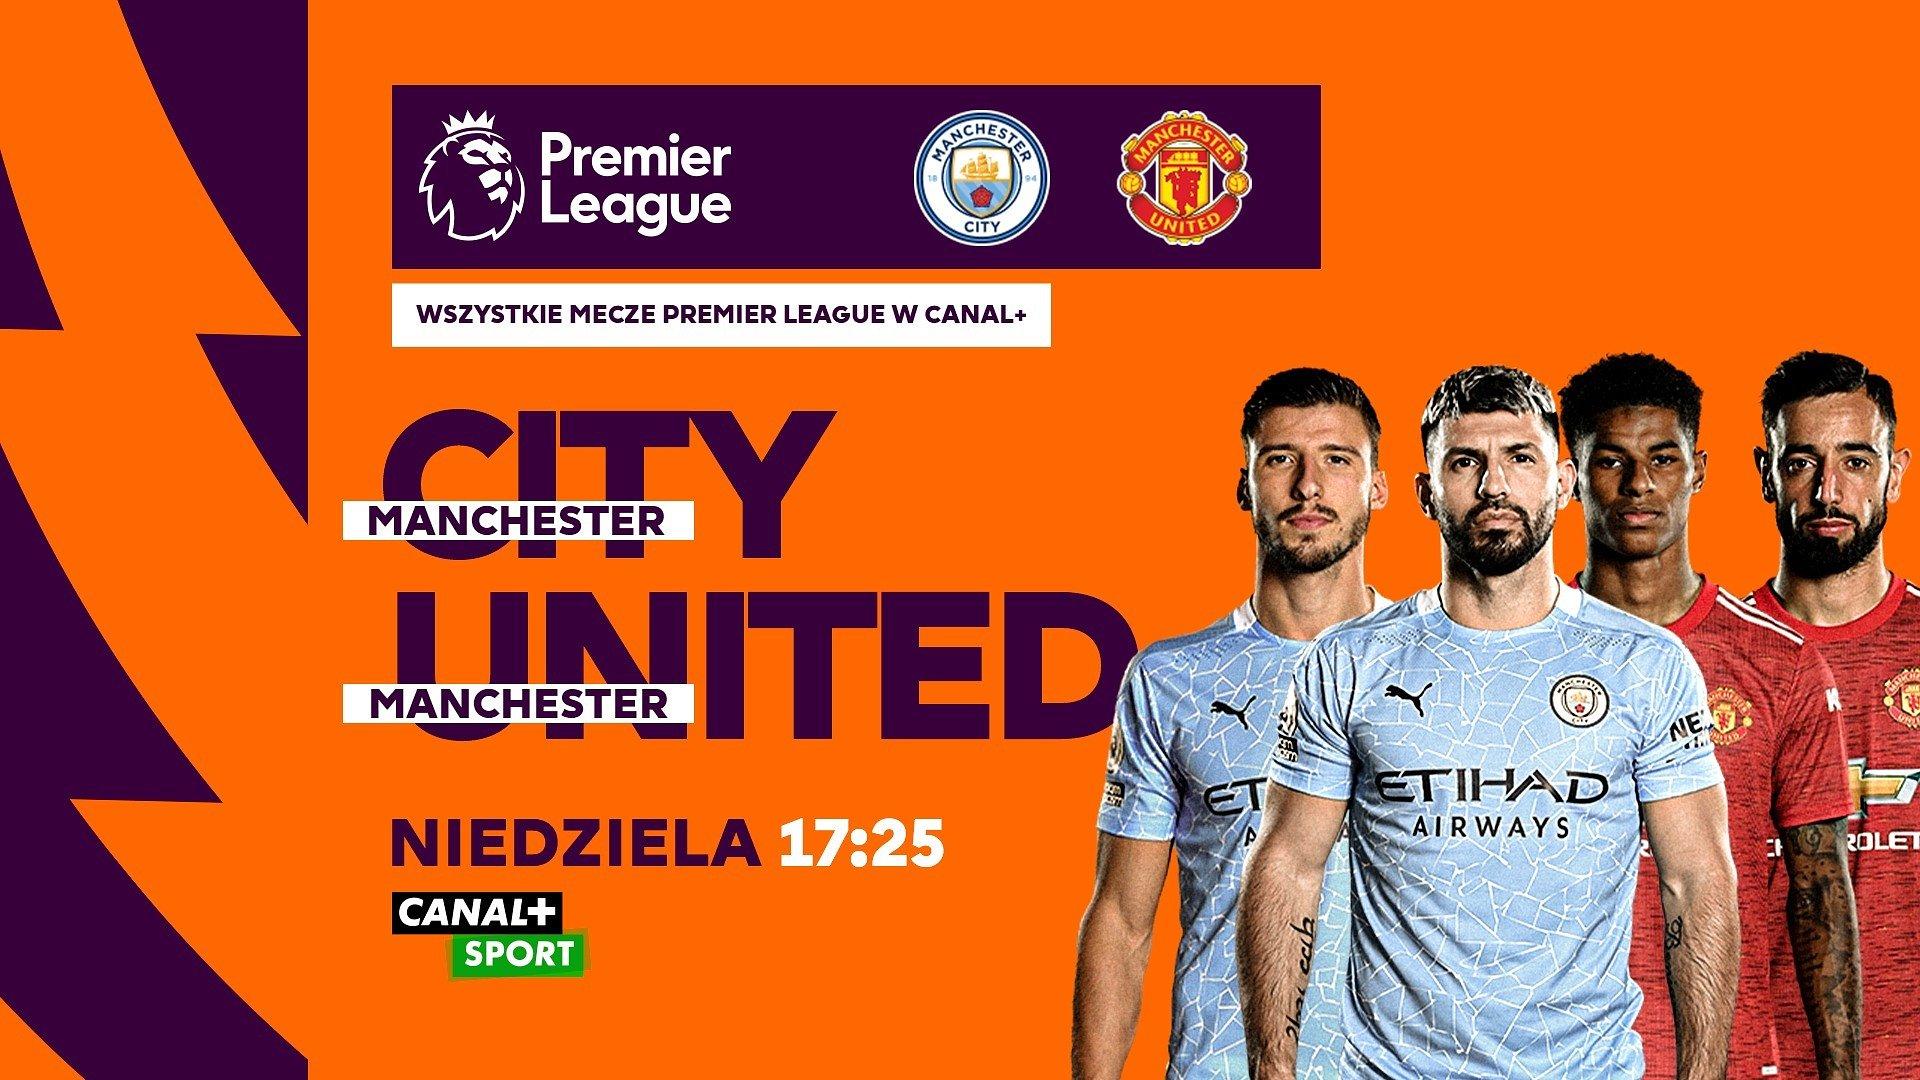 Derby Manchesteru hitem weekendu w CANAL+